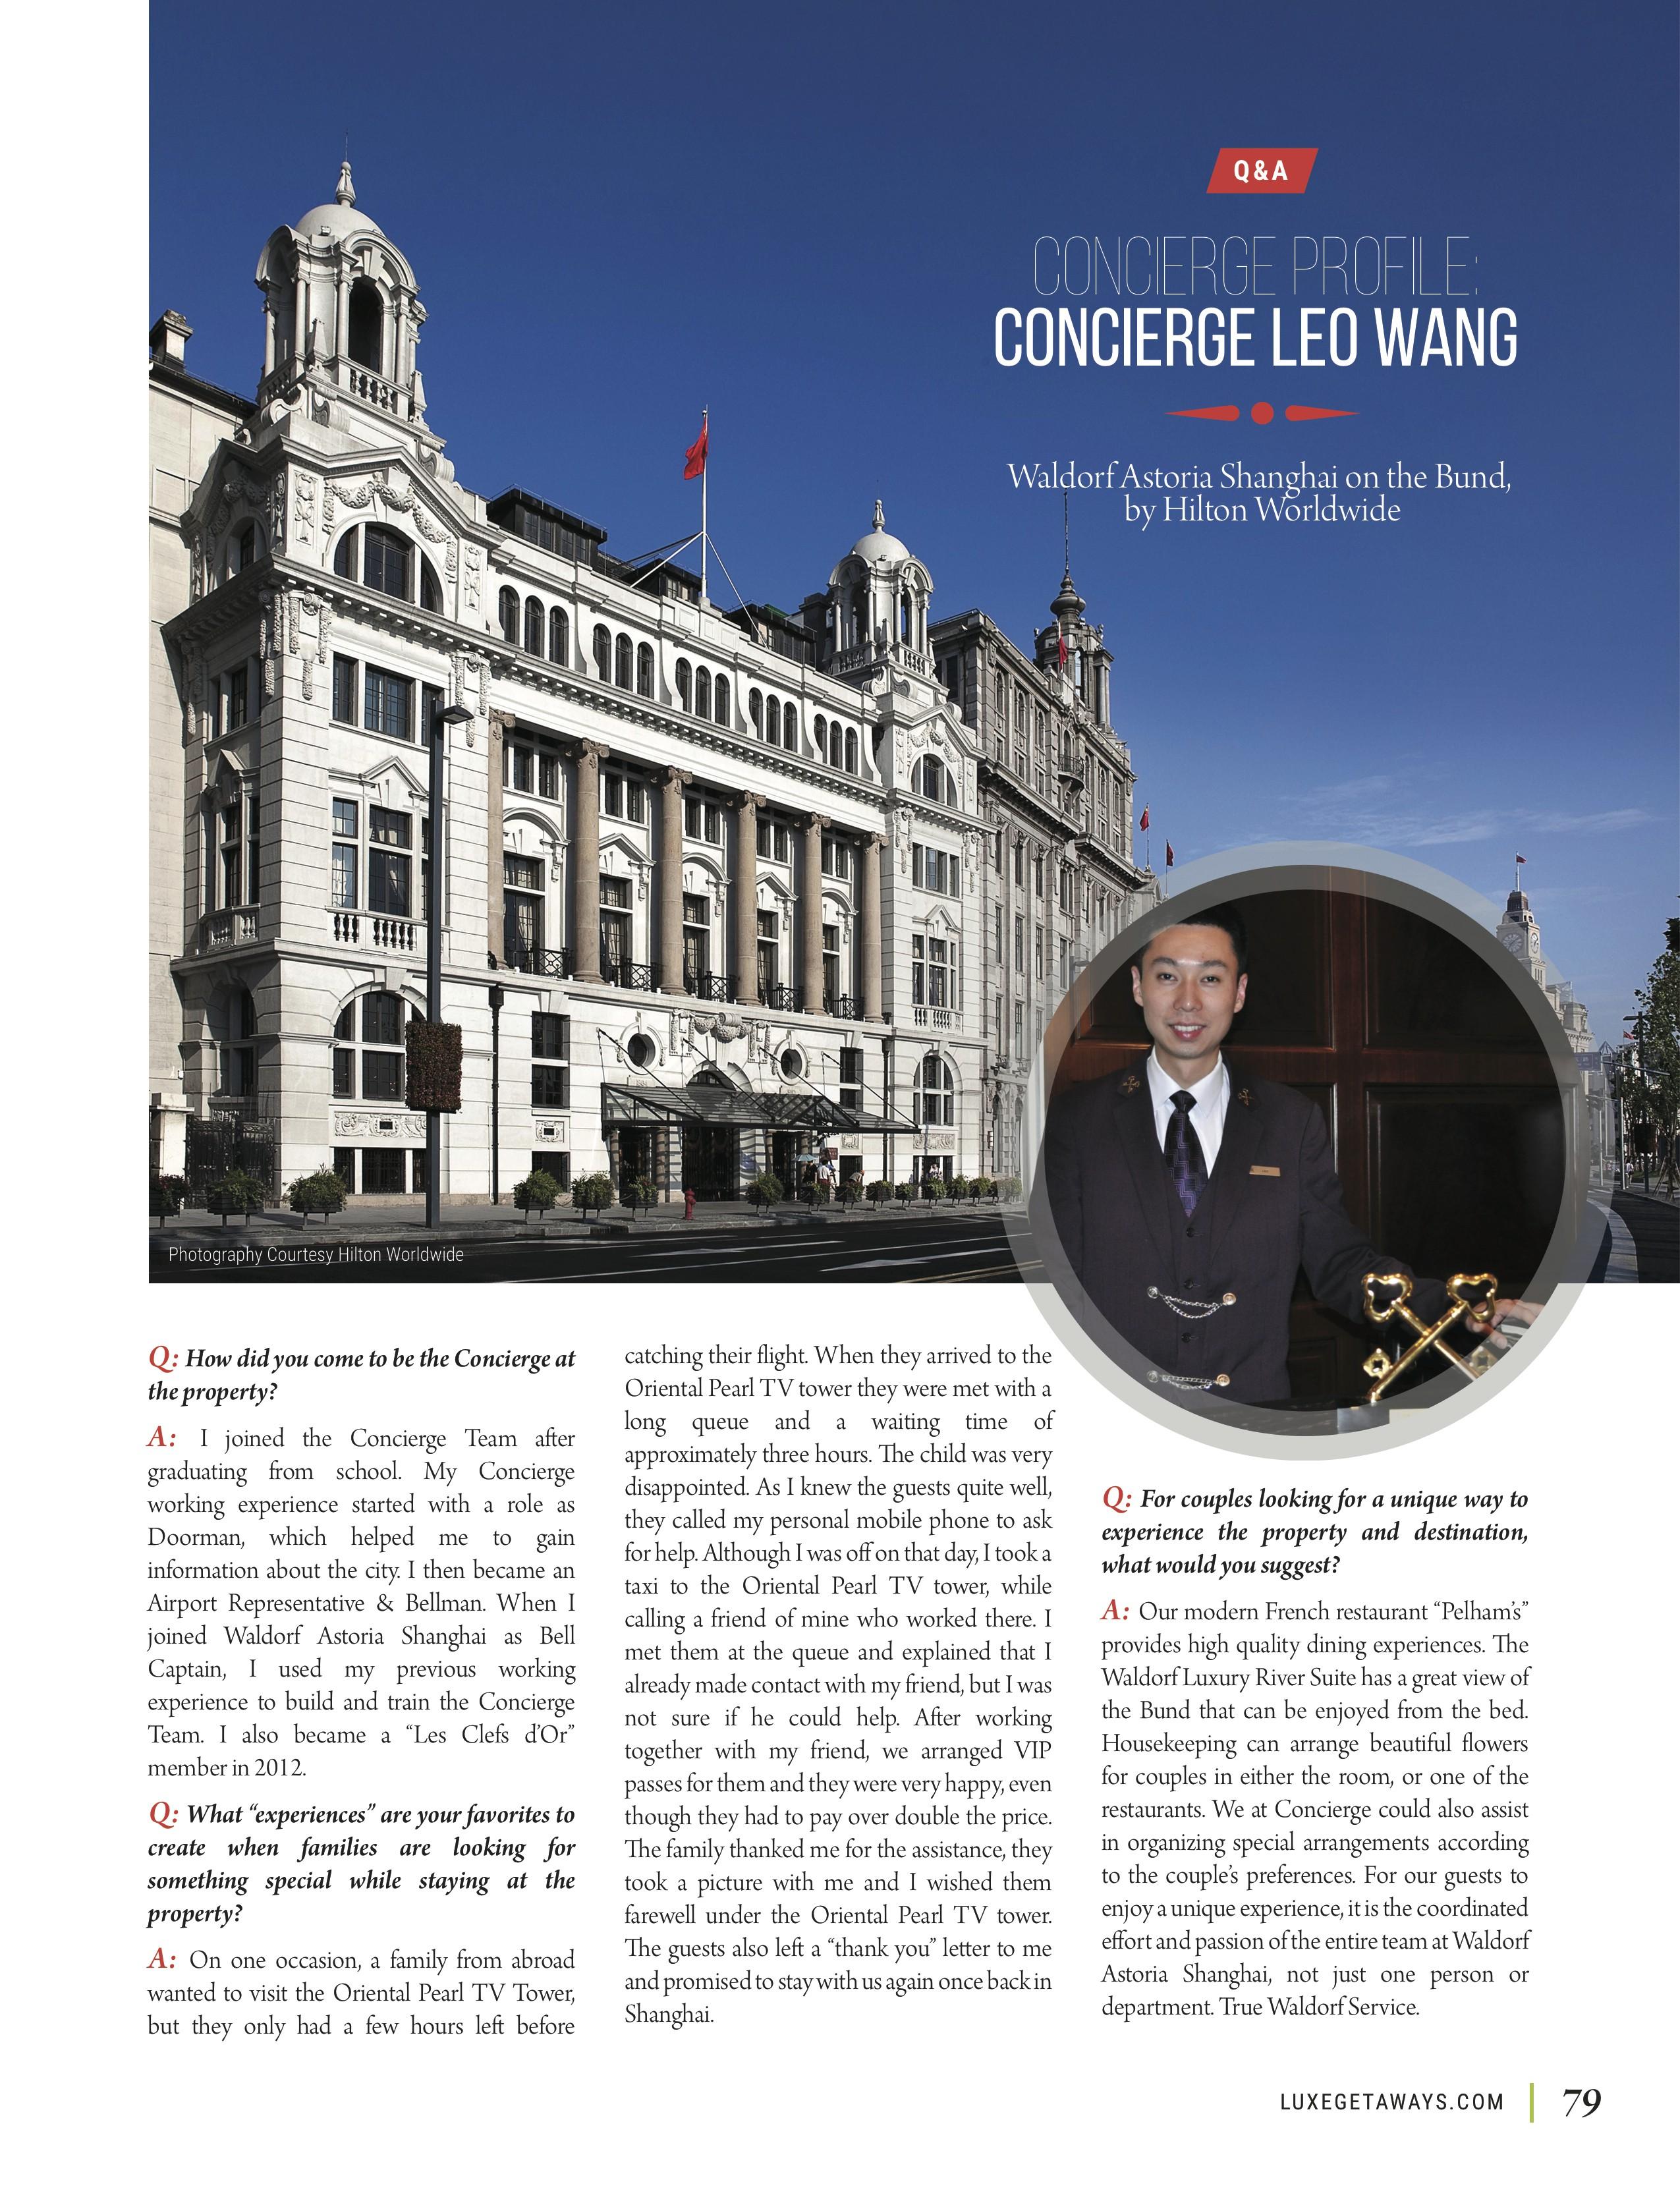 luxegetaways_fall2016_hilton-concierges_2